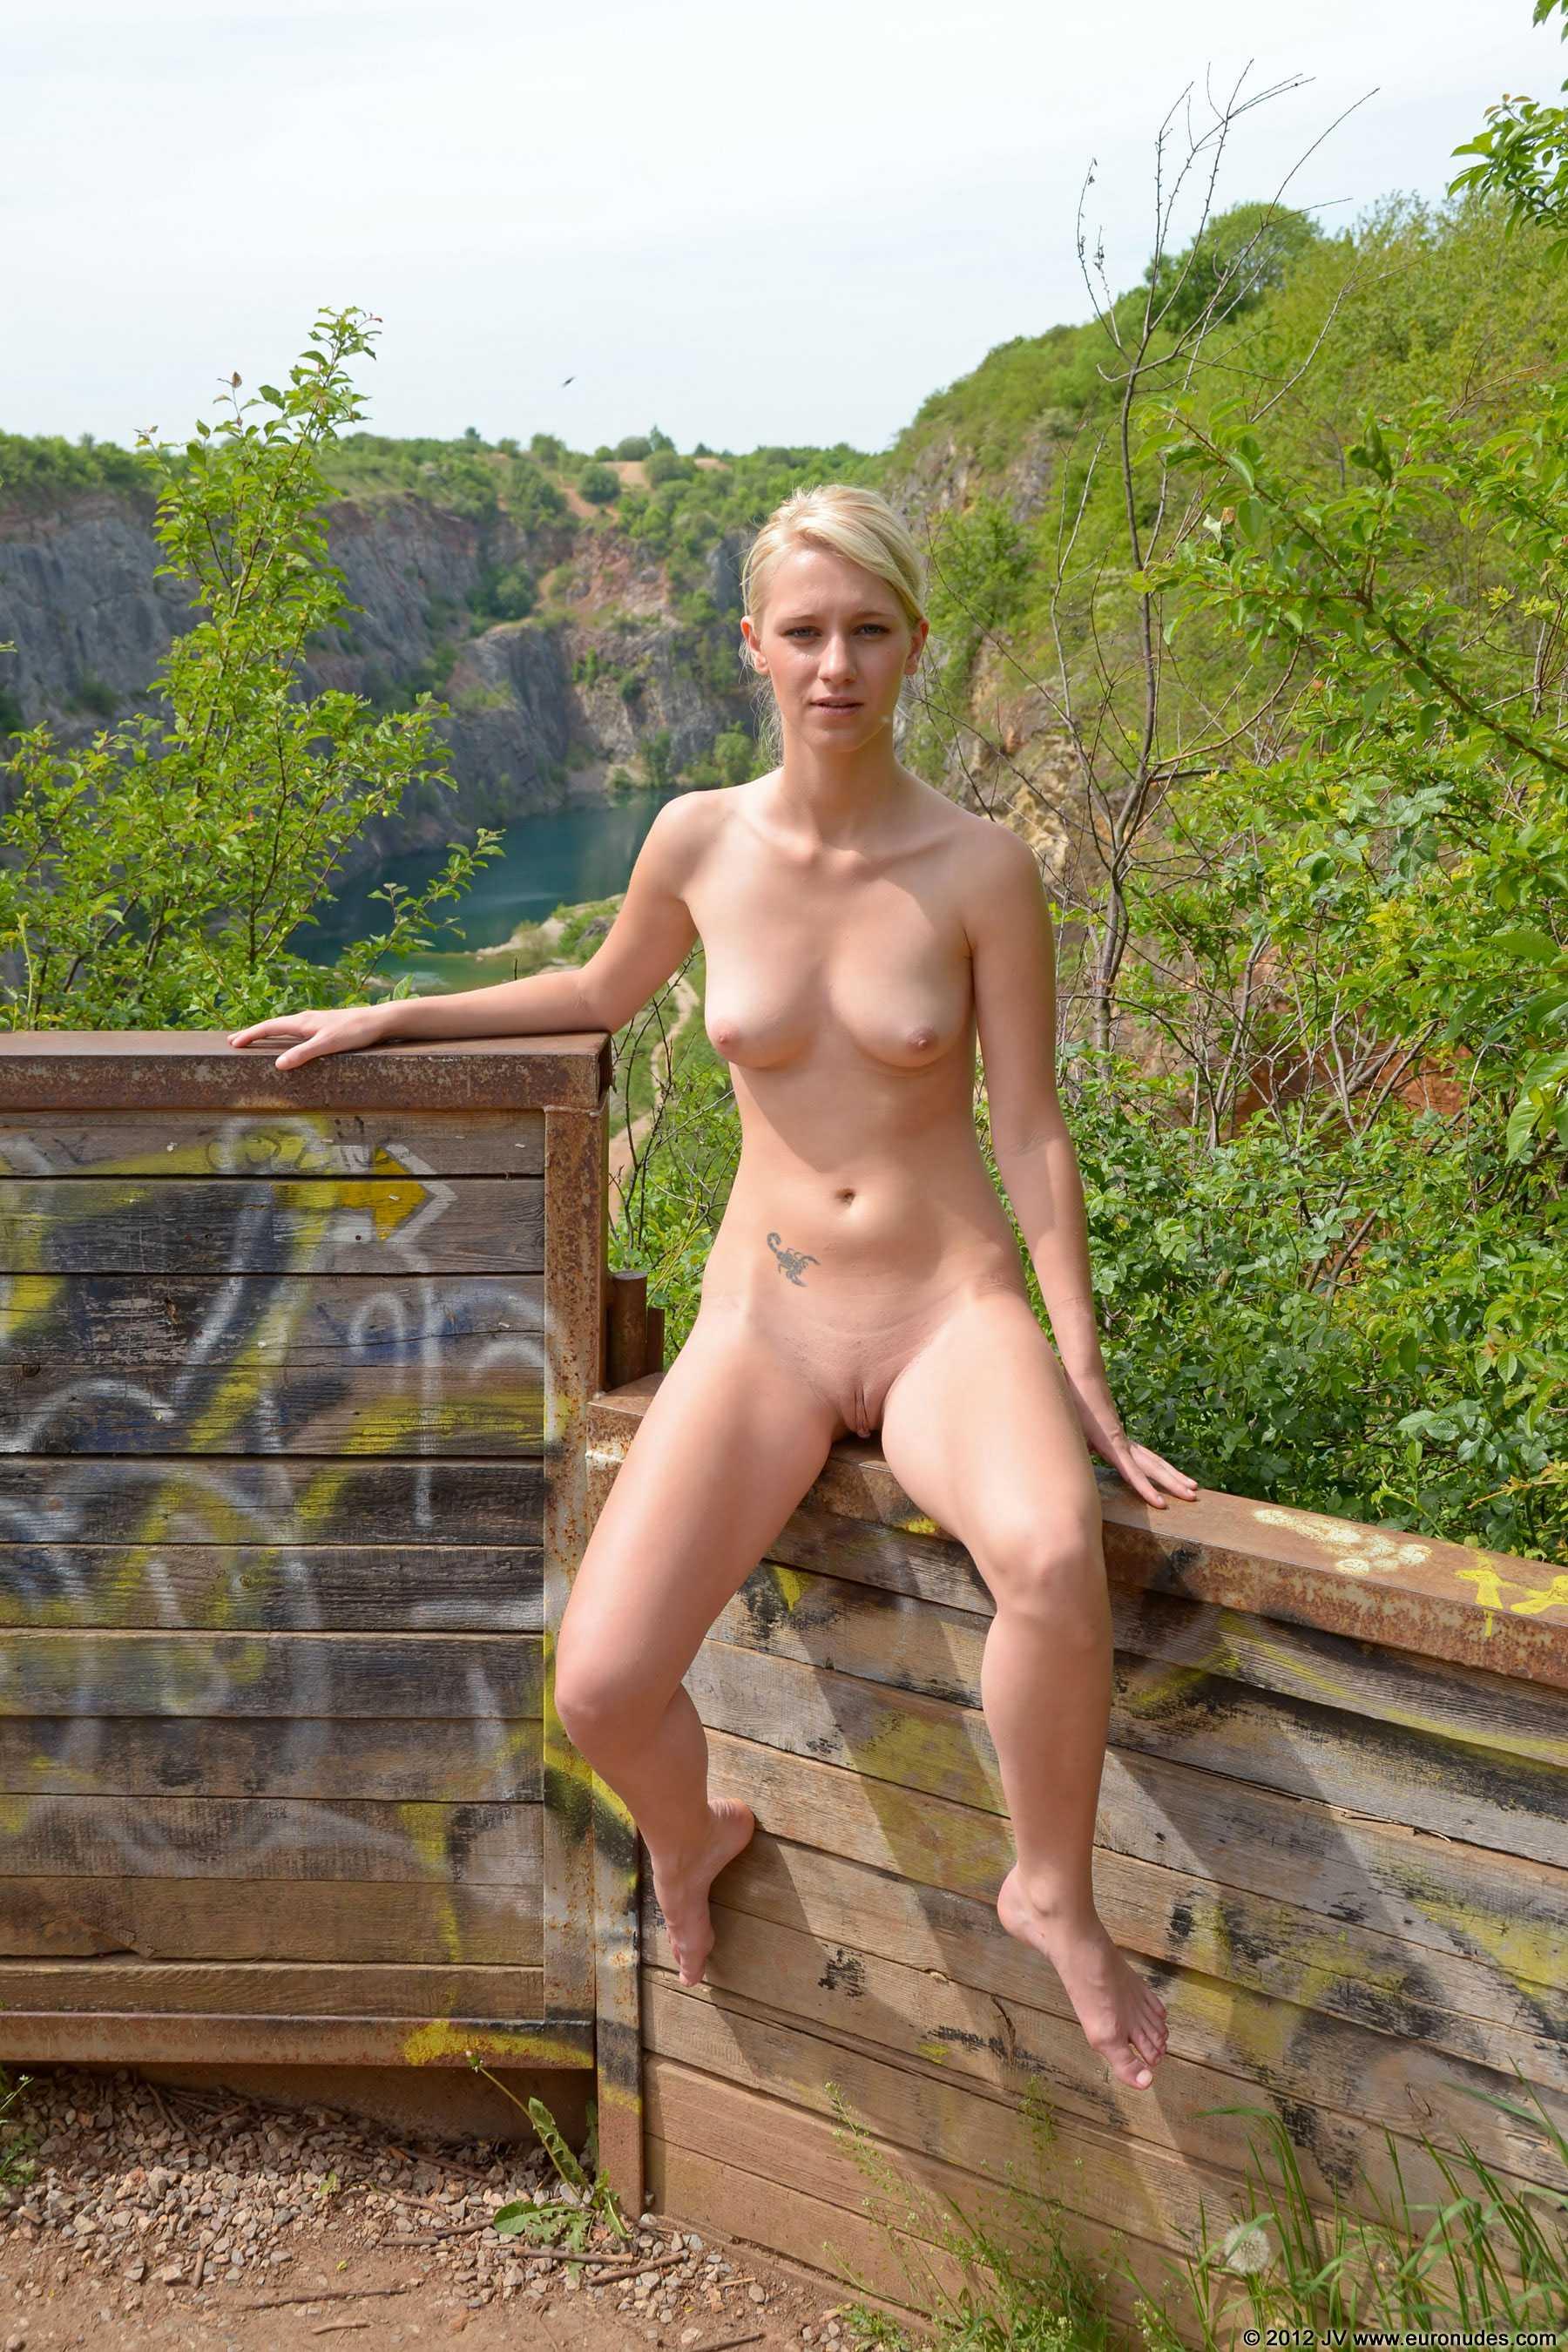 Hot naked girls grinding self shot